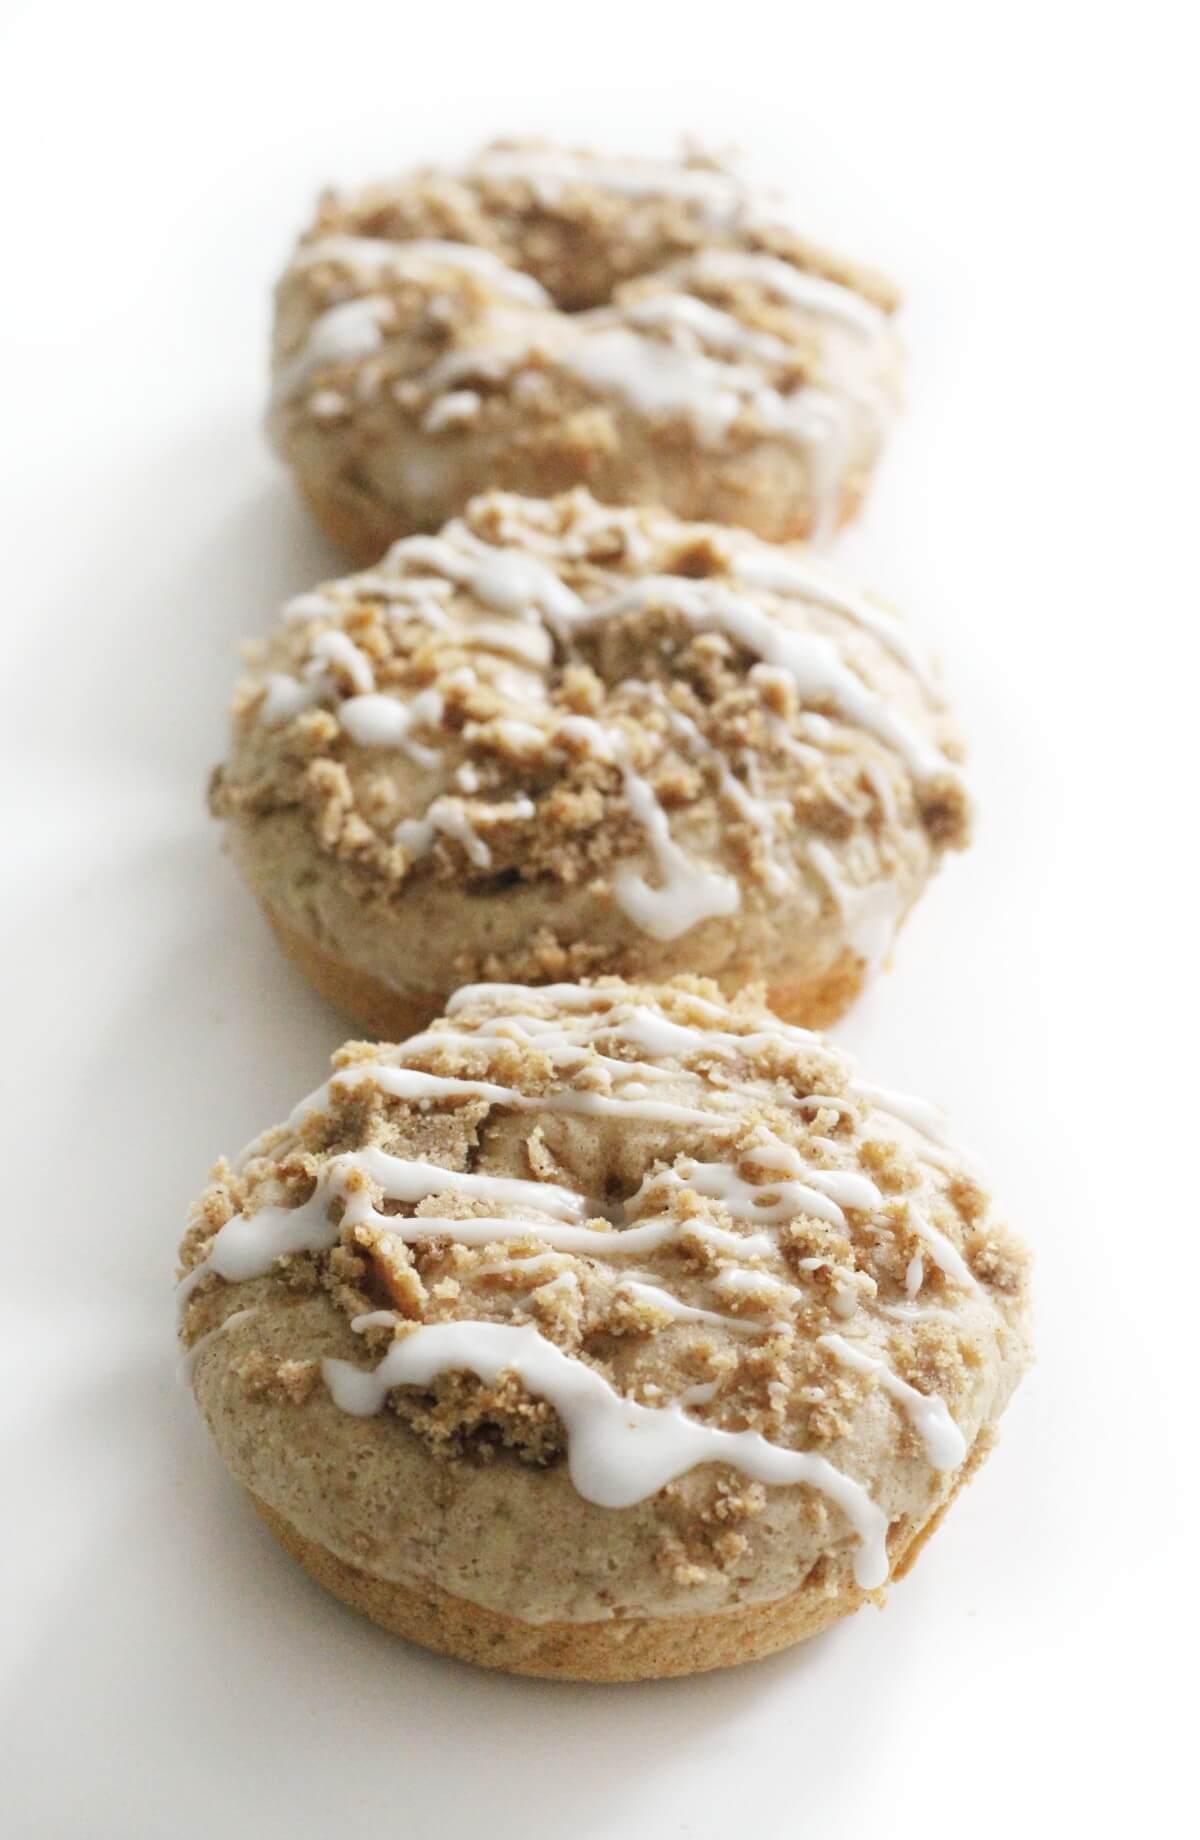 three gluten-free coffee cake doughnuts lined up